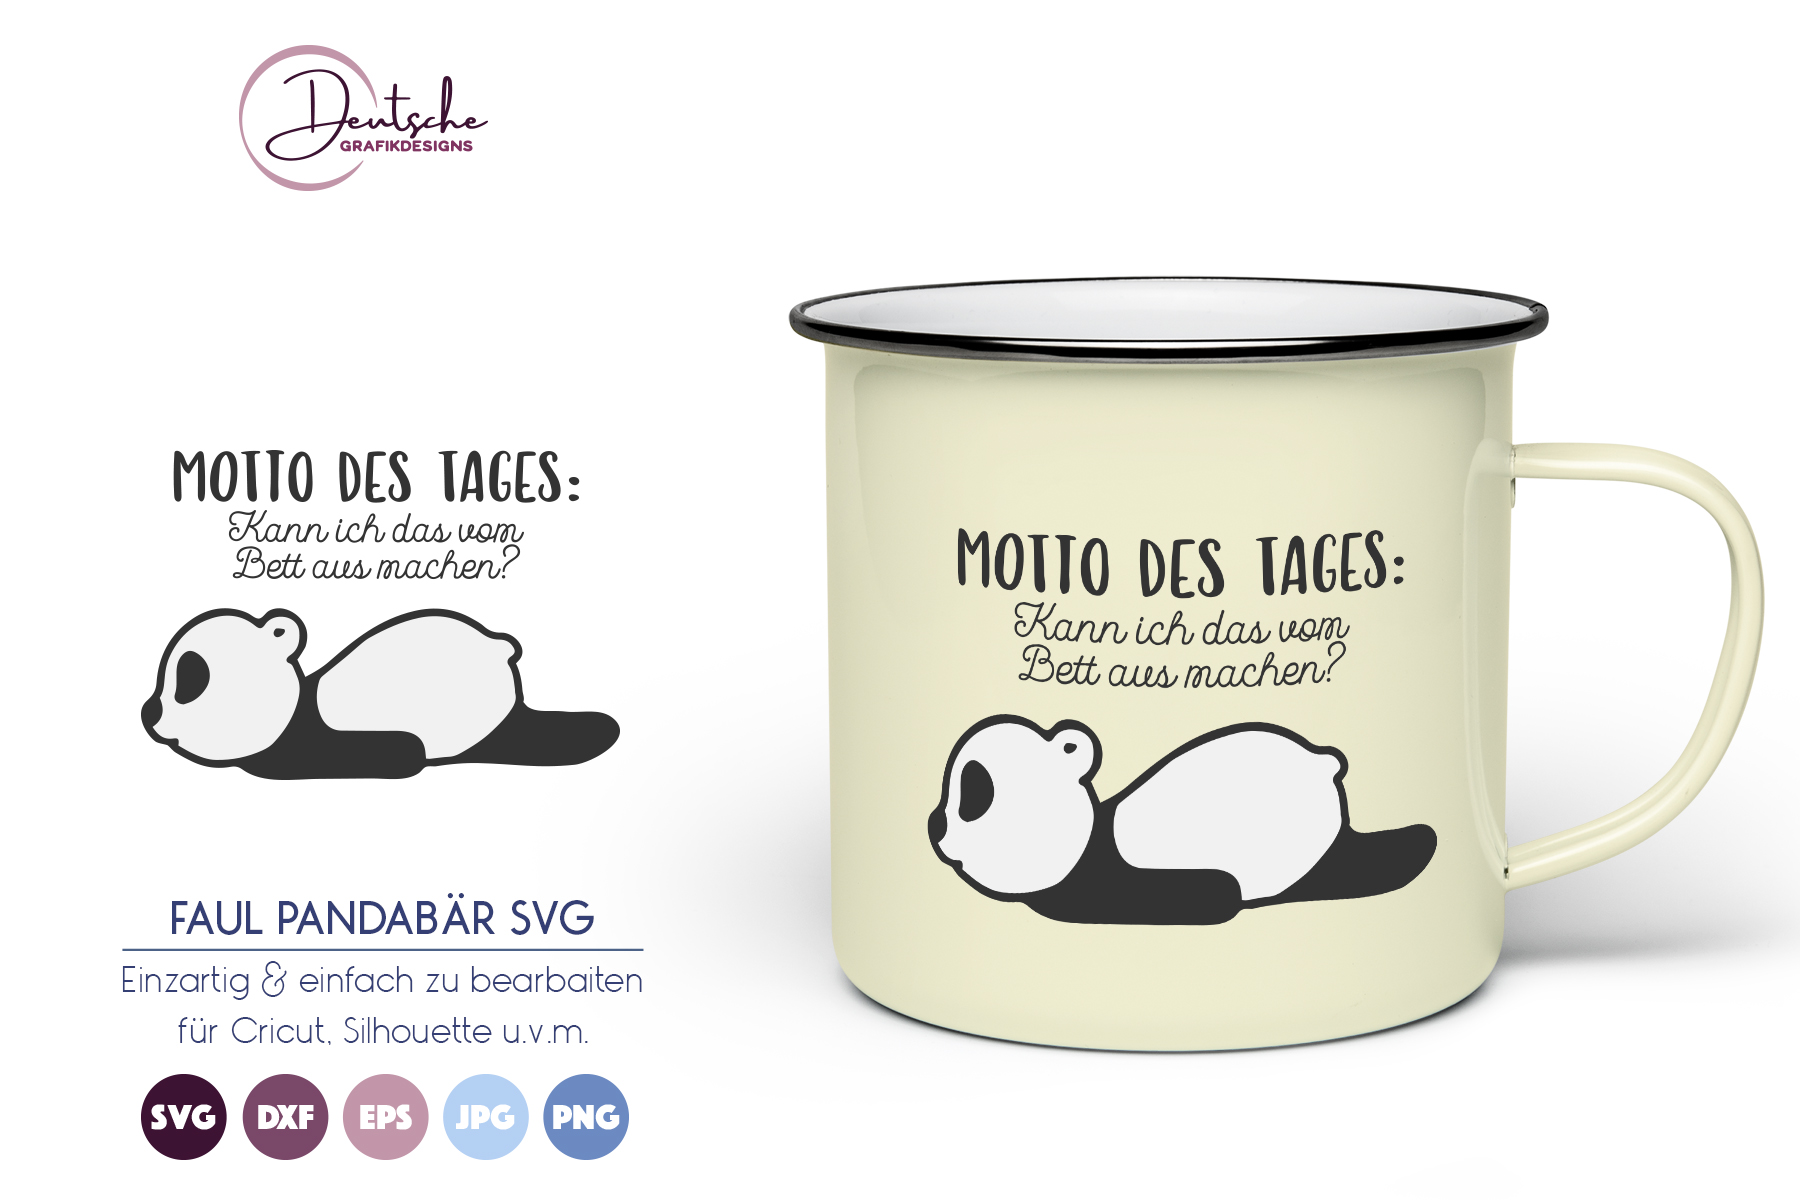 Motto des Tages | Pandabär SVG example image 1